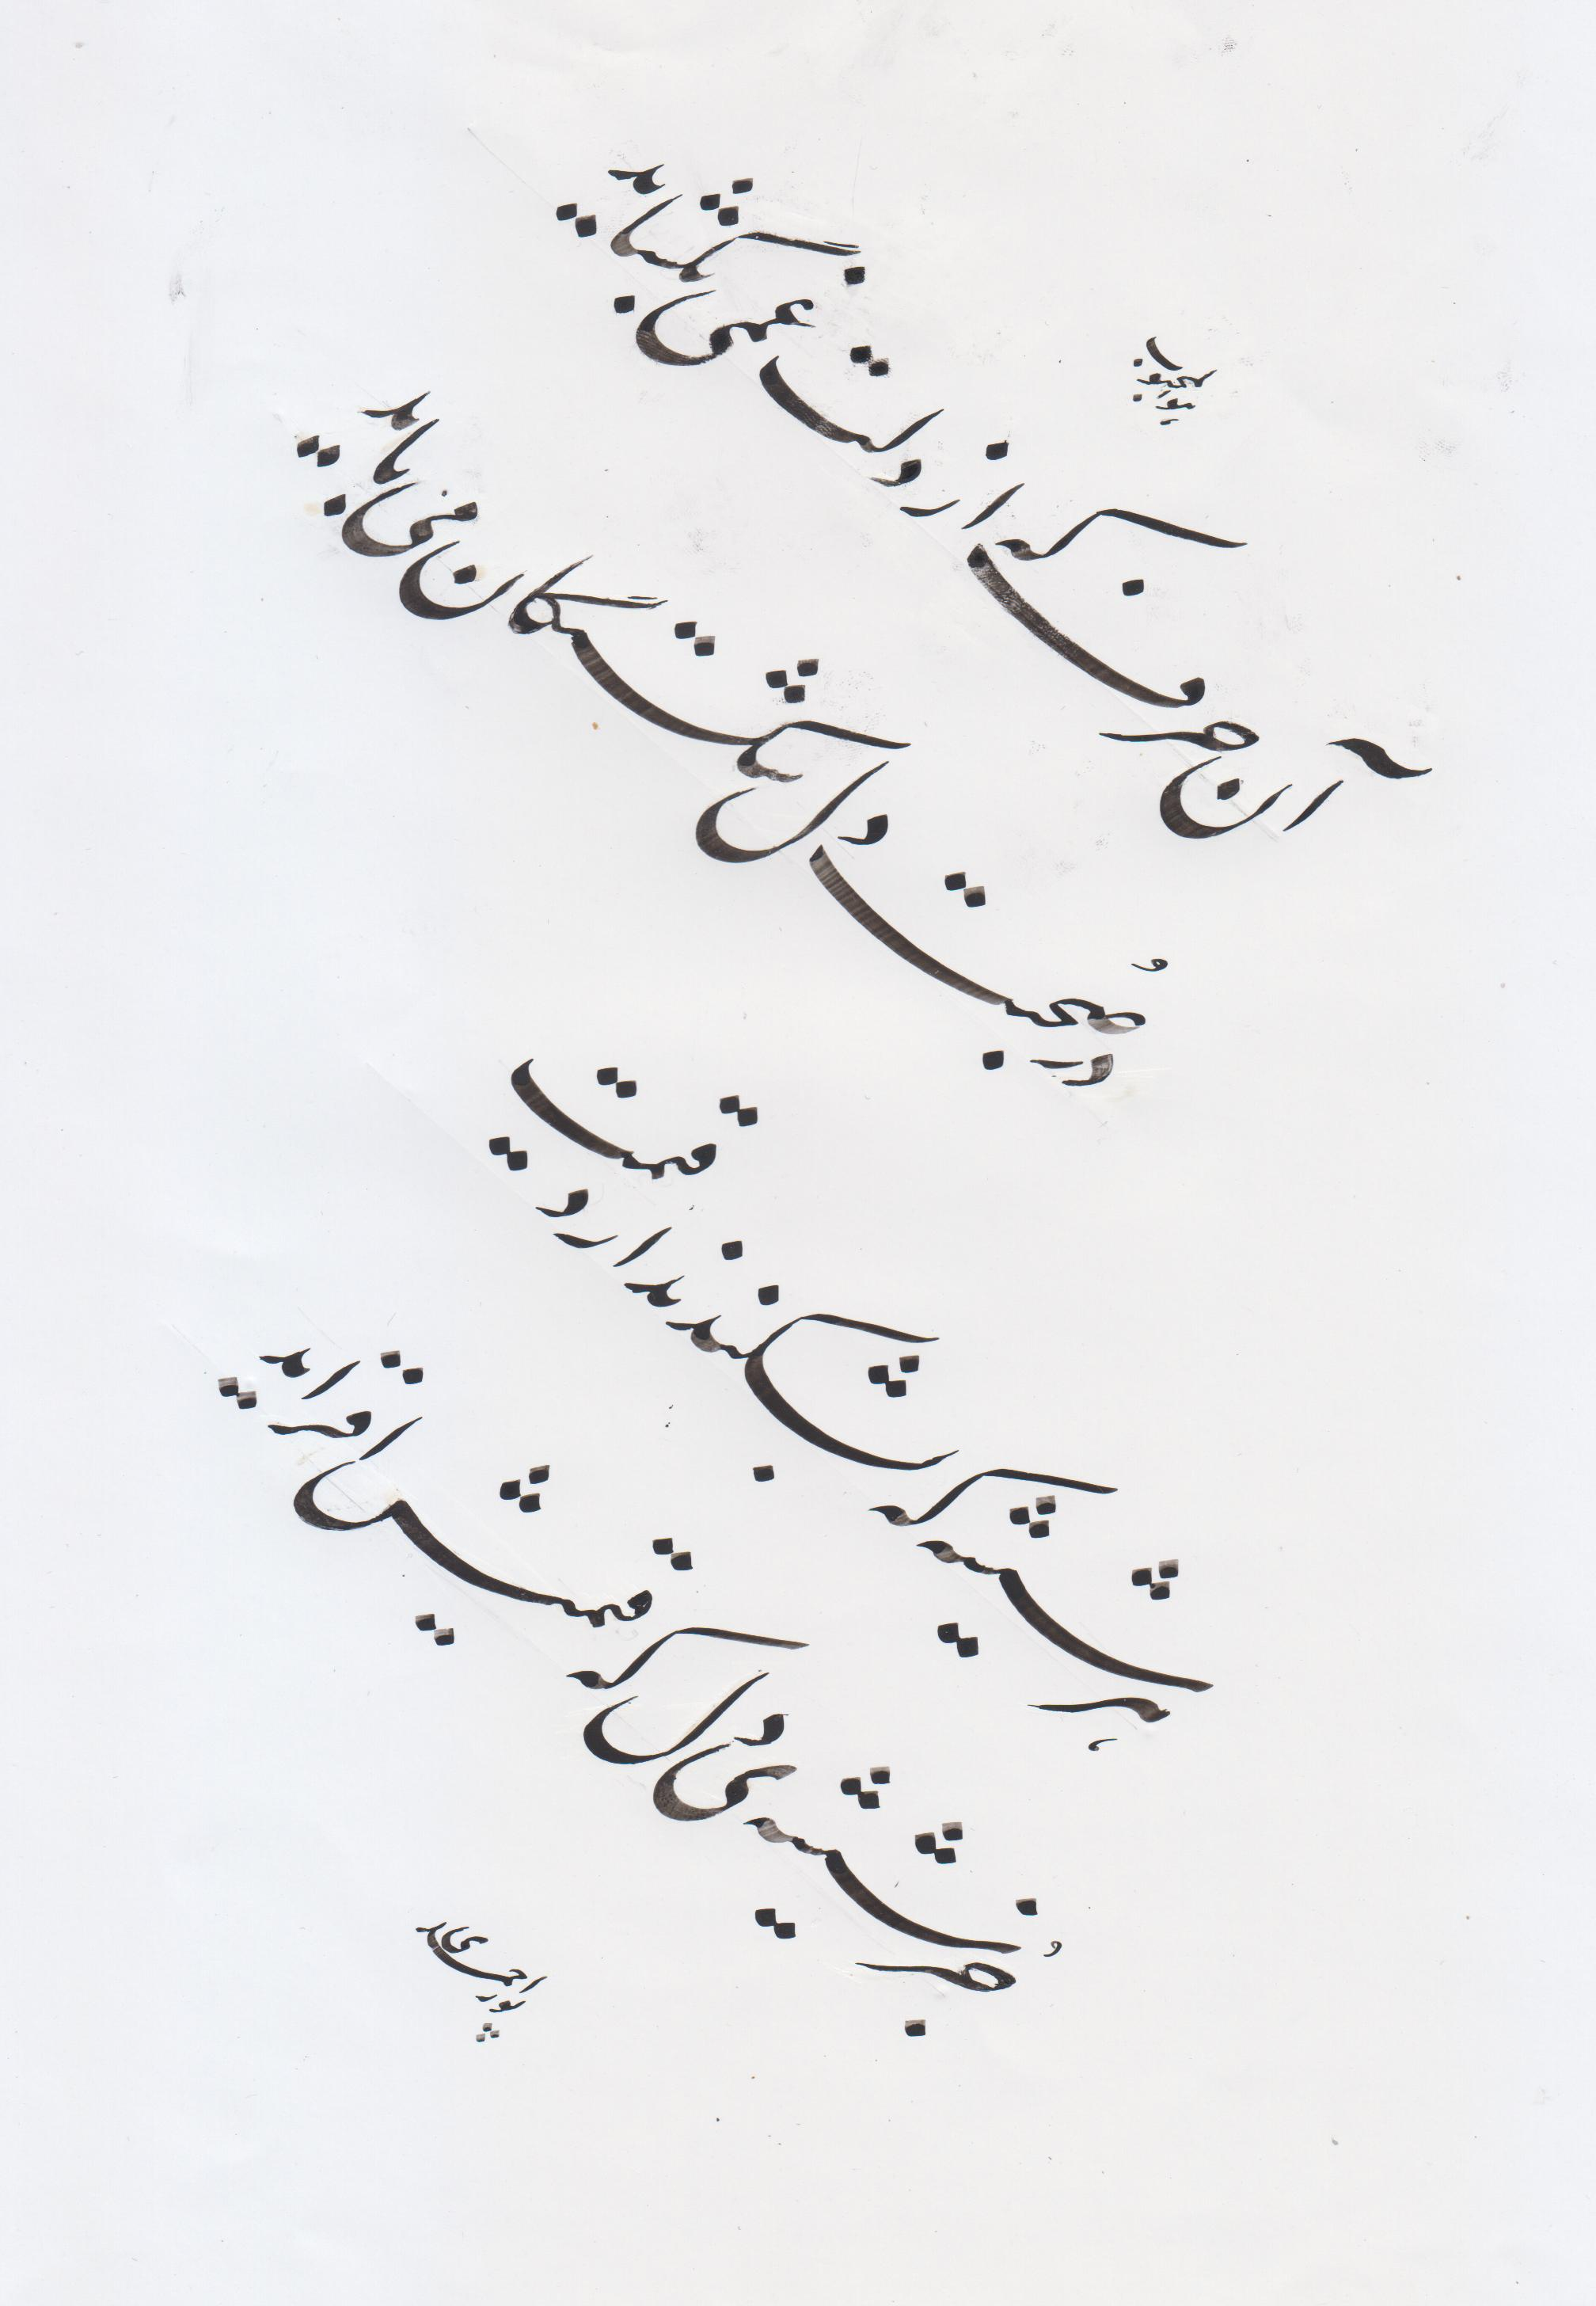 epq1_خانم_پور_احمدی_001.jpg